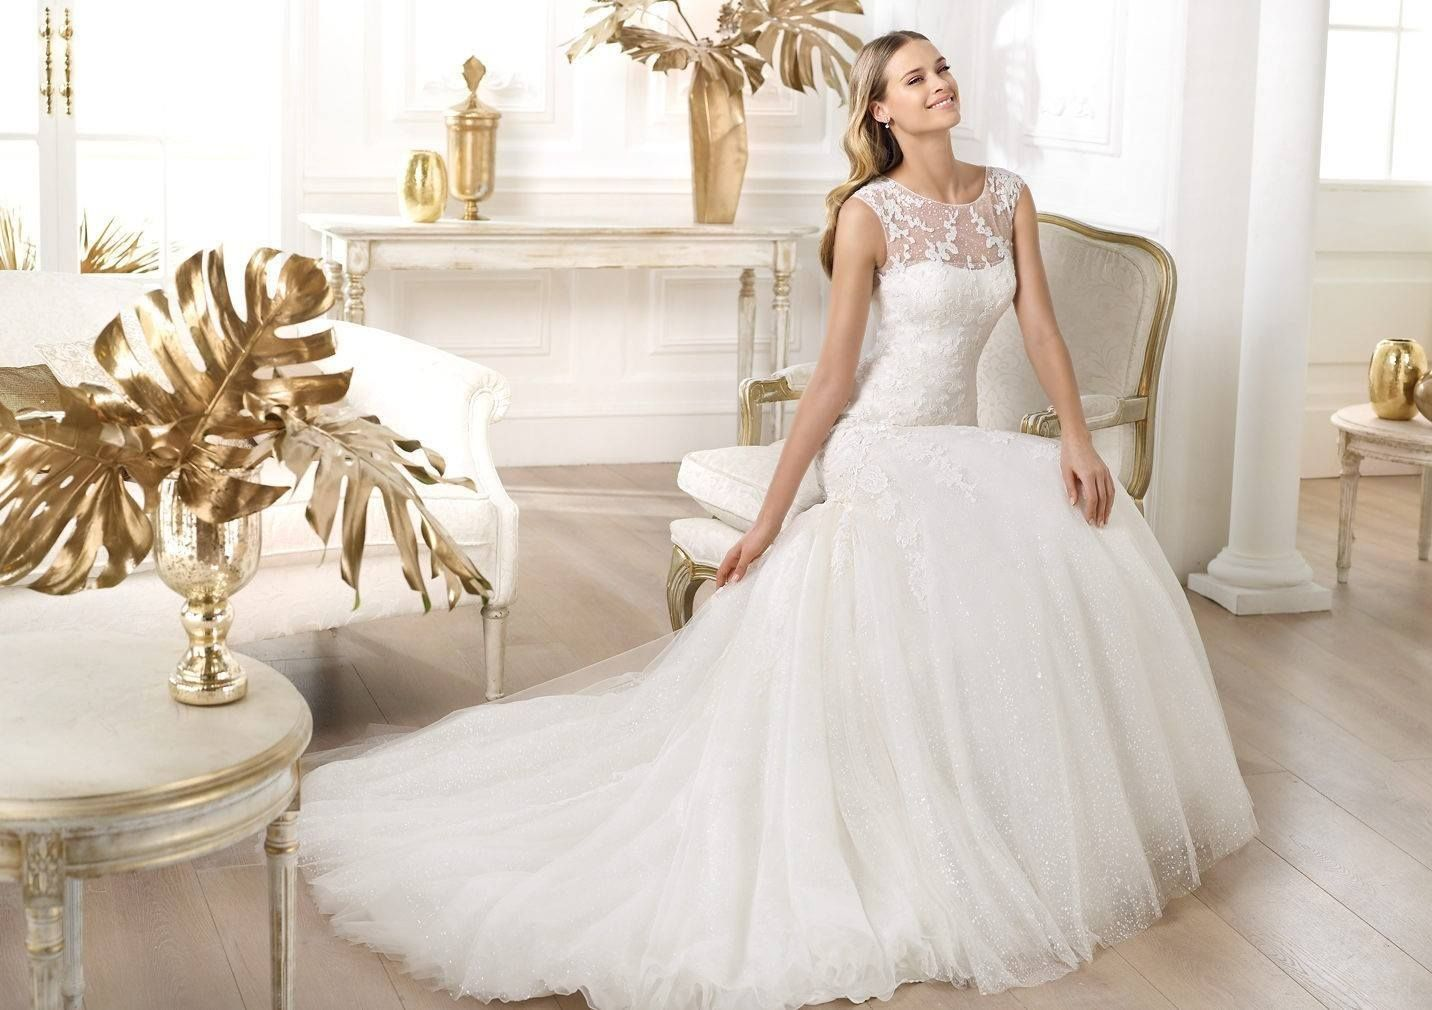 Fashion Art Wedding Bridal Womenswear Menswear Shoes Childrenswear Desses Jewelry Design Rental Wedding Dresses Wedding Dresses Wedding Dresses Ebay